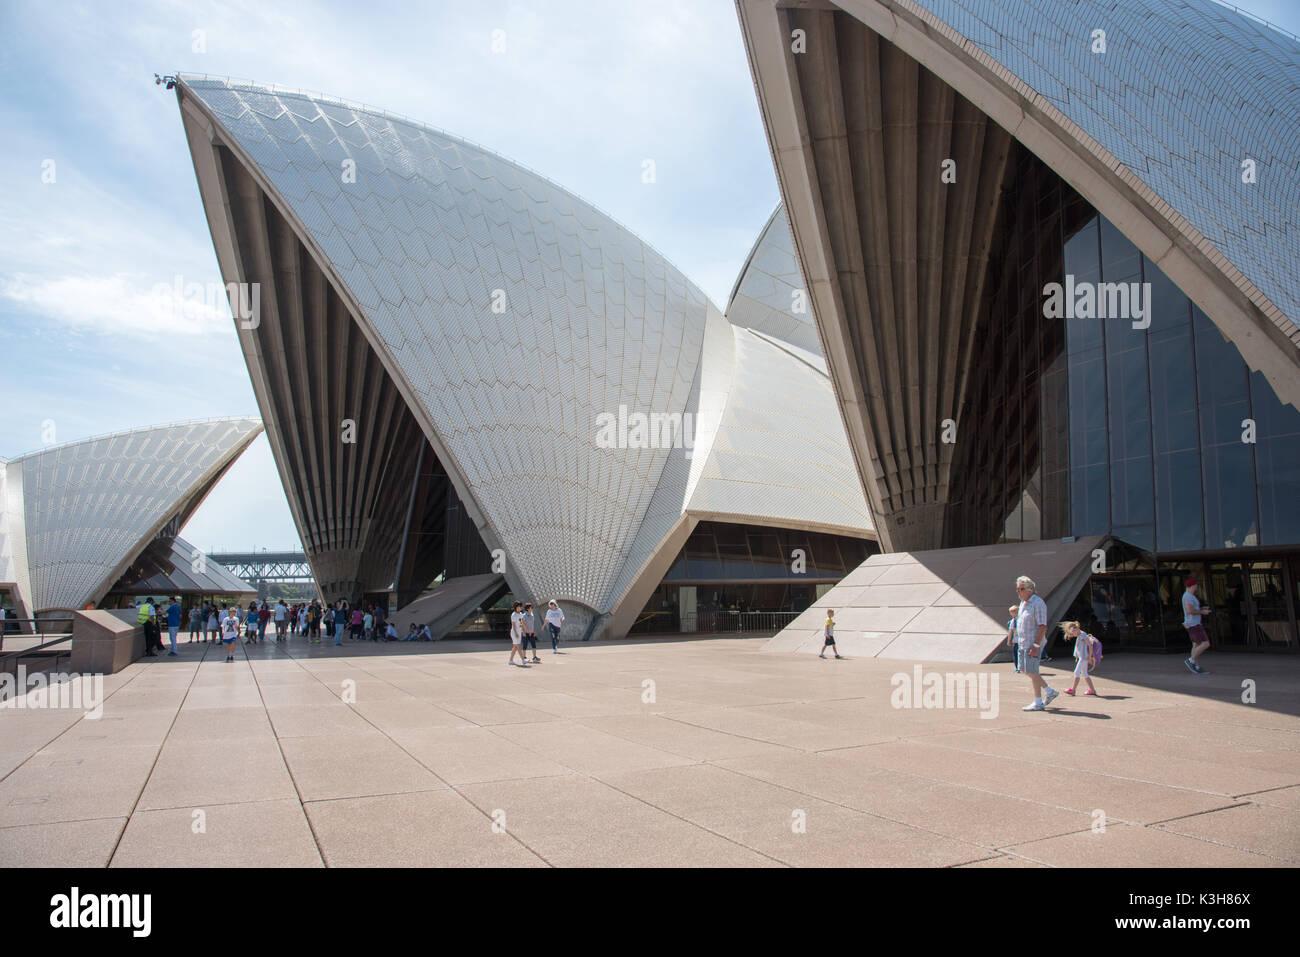 SYDNEY,NSW,AUSTRALIA-NOVEMBER 20,2016:Tourists outside the Sydney Opera House with precast concrete chevron pattern roof in Sydney, Australia - Stock Image